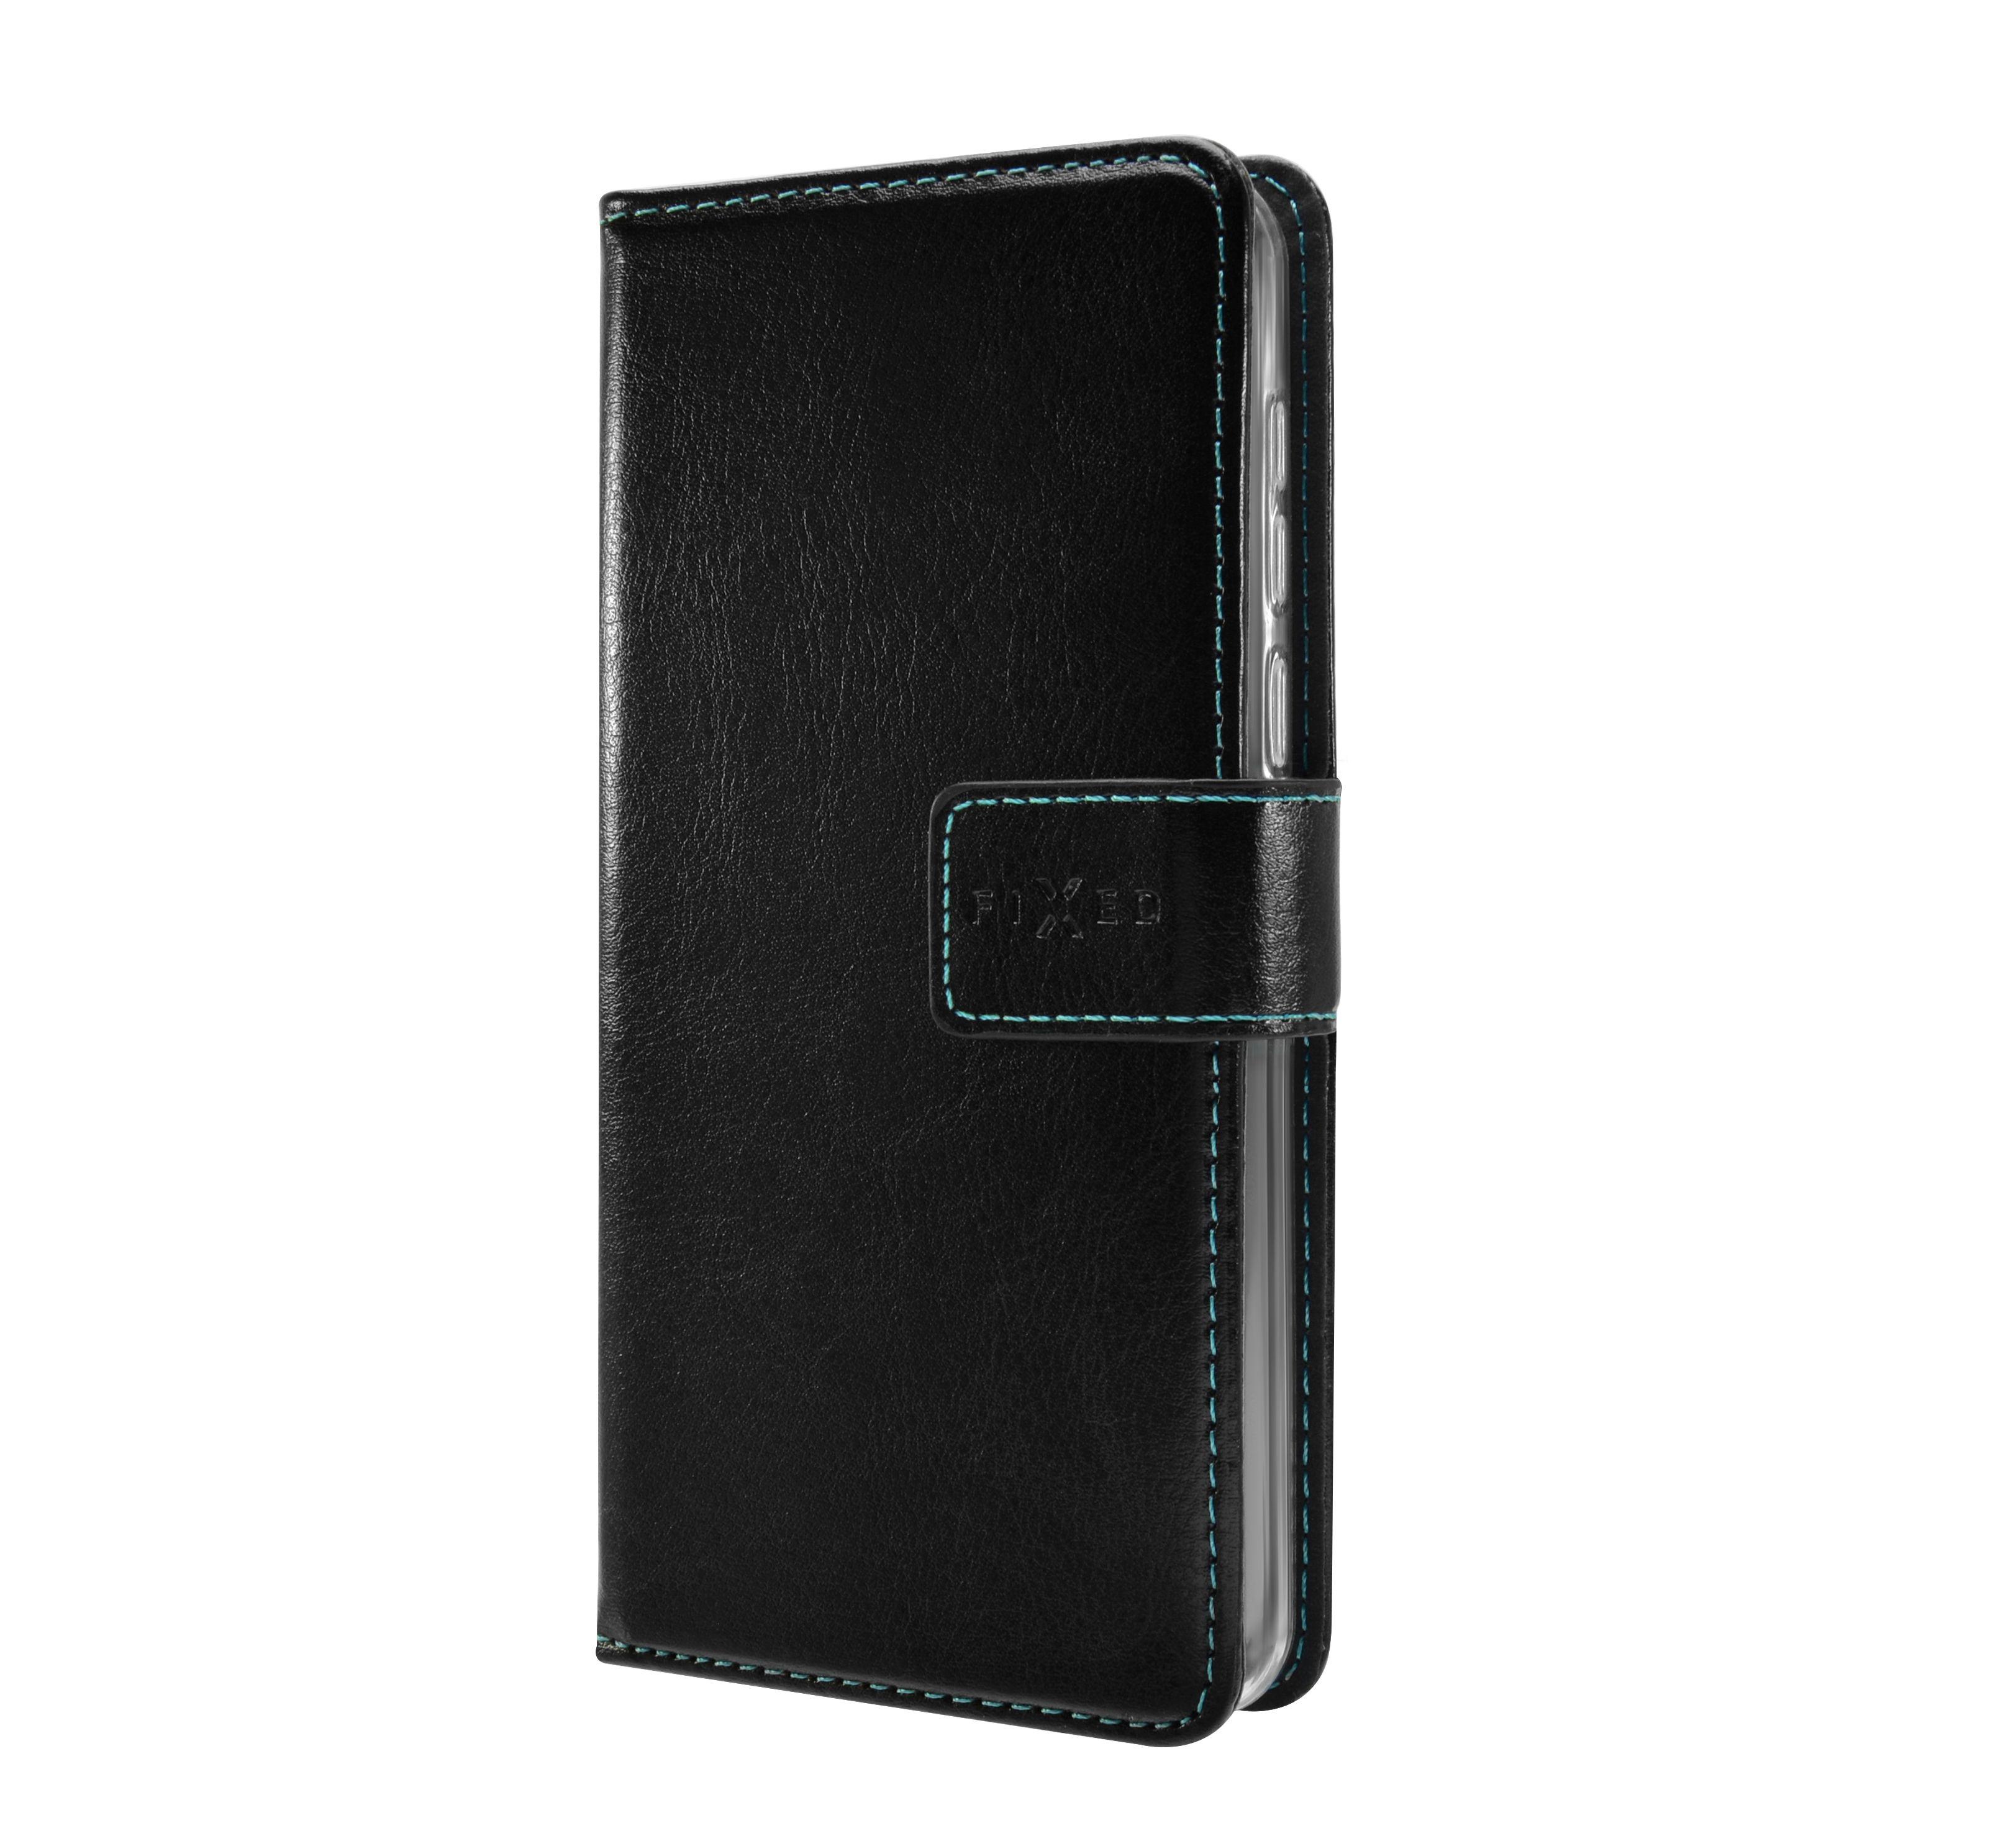 Pouzdro typu kniha FIXED Opus pro Samsung Galaxy A10s, černé